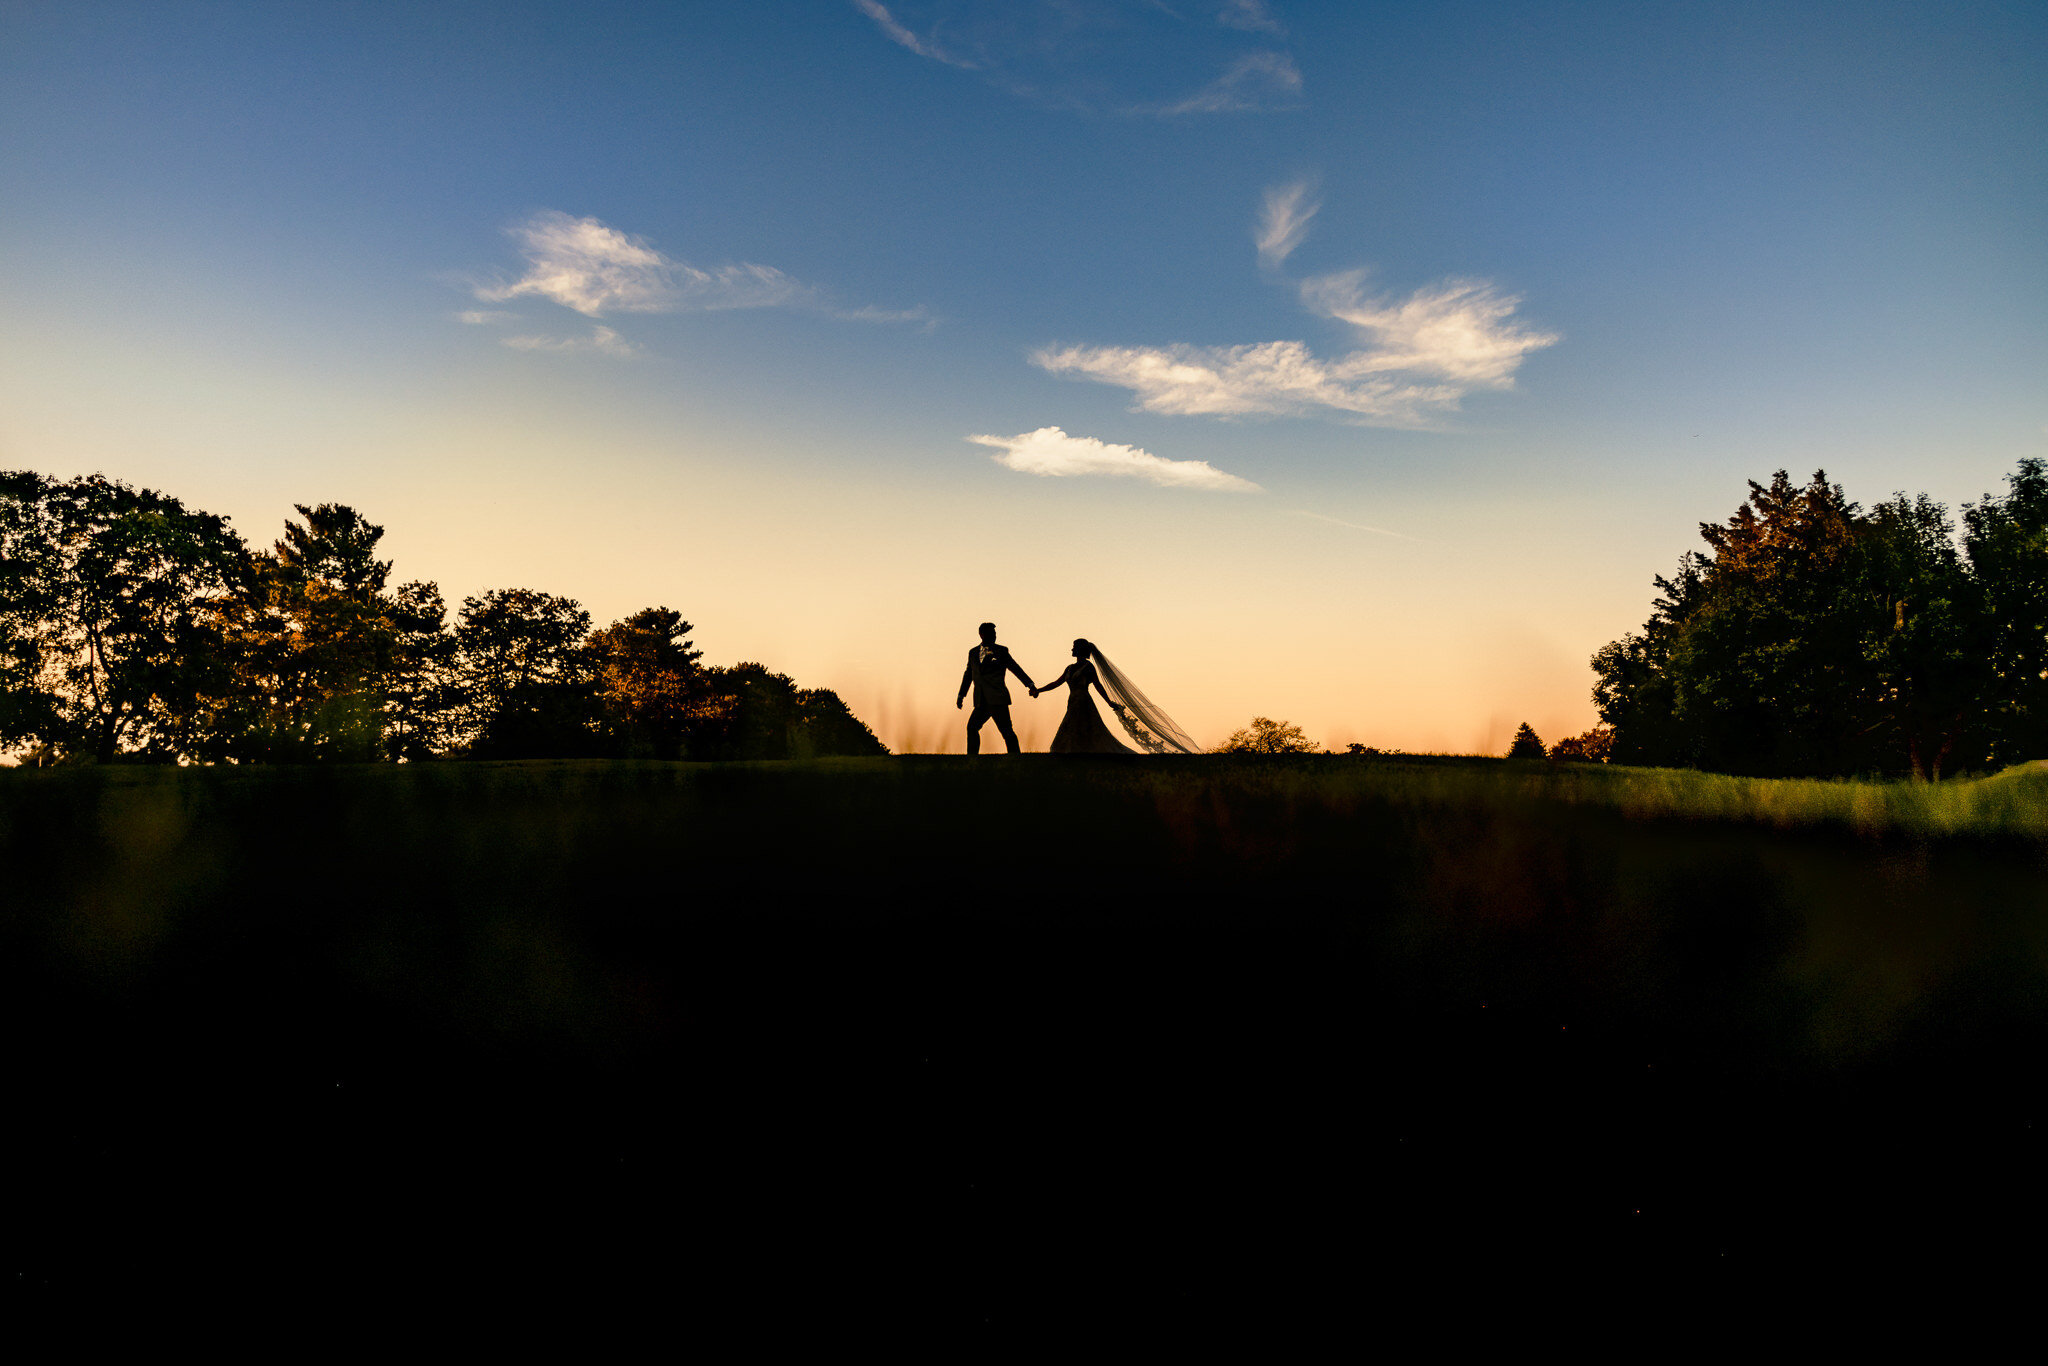 Coyle-Forsgate-Country-Club-Wedding-Photographer-31.JPG